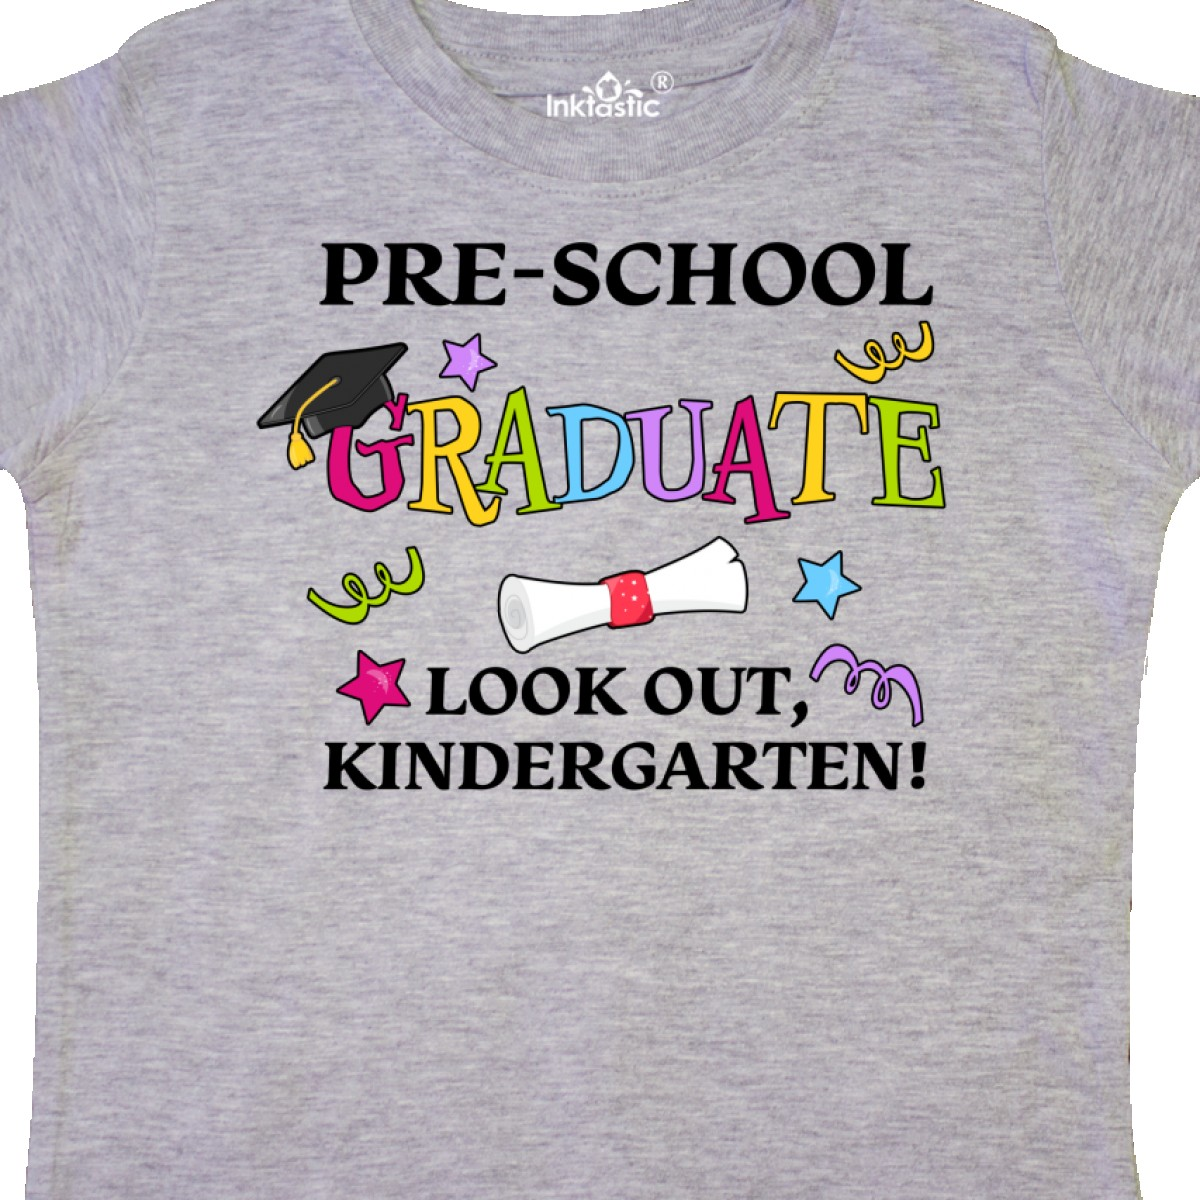 Inktastic-Pre-School-Graduate-Look-Out-Kindergarten-Toddler-T-Shirt-Graduation thumbnail 4